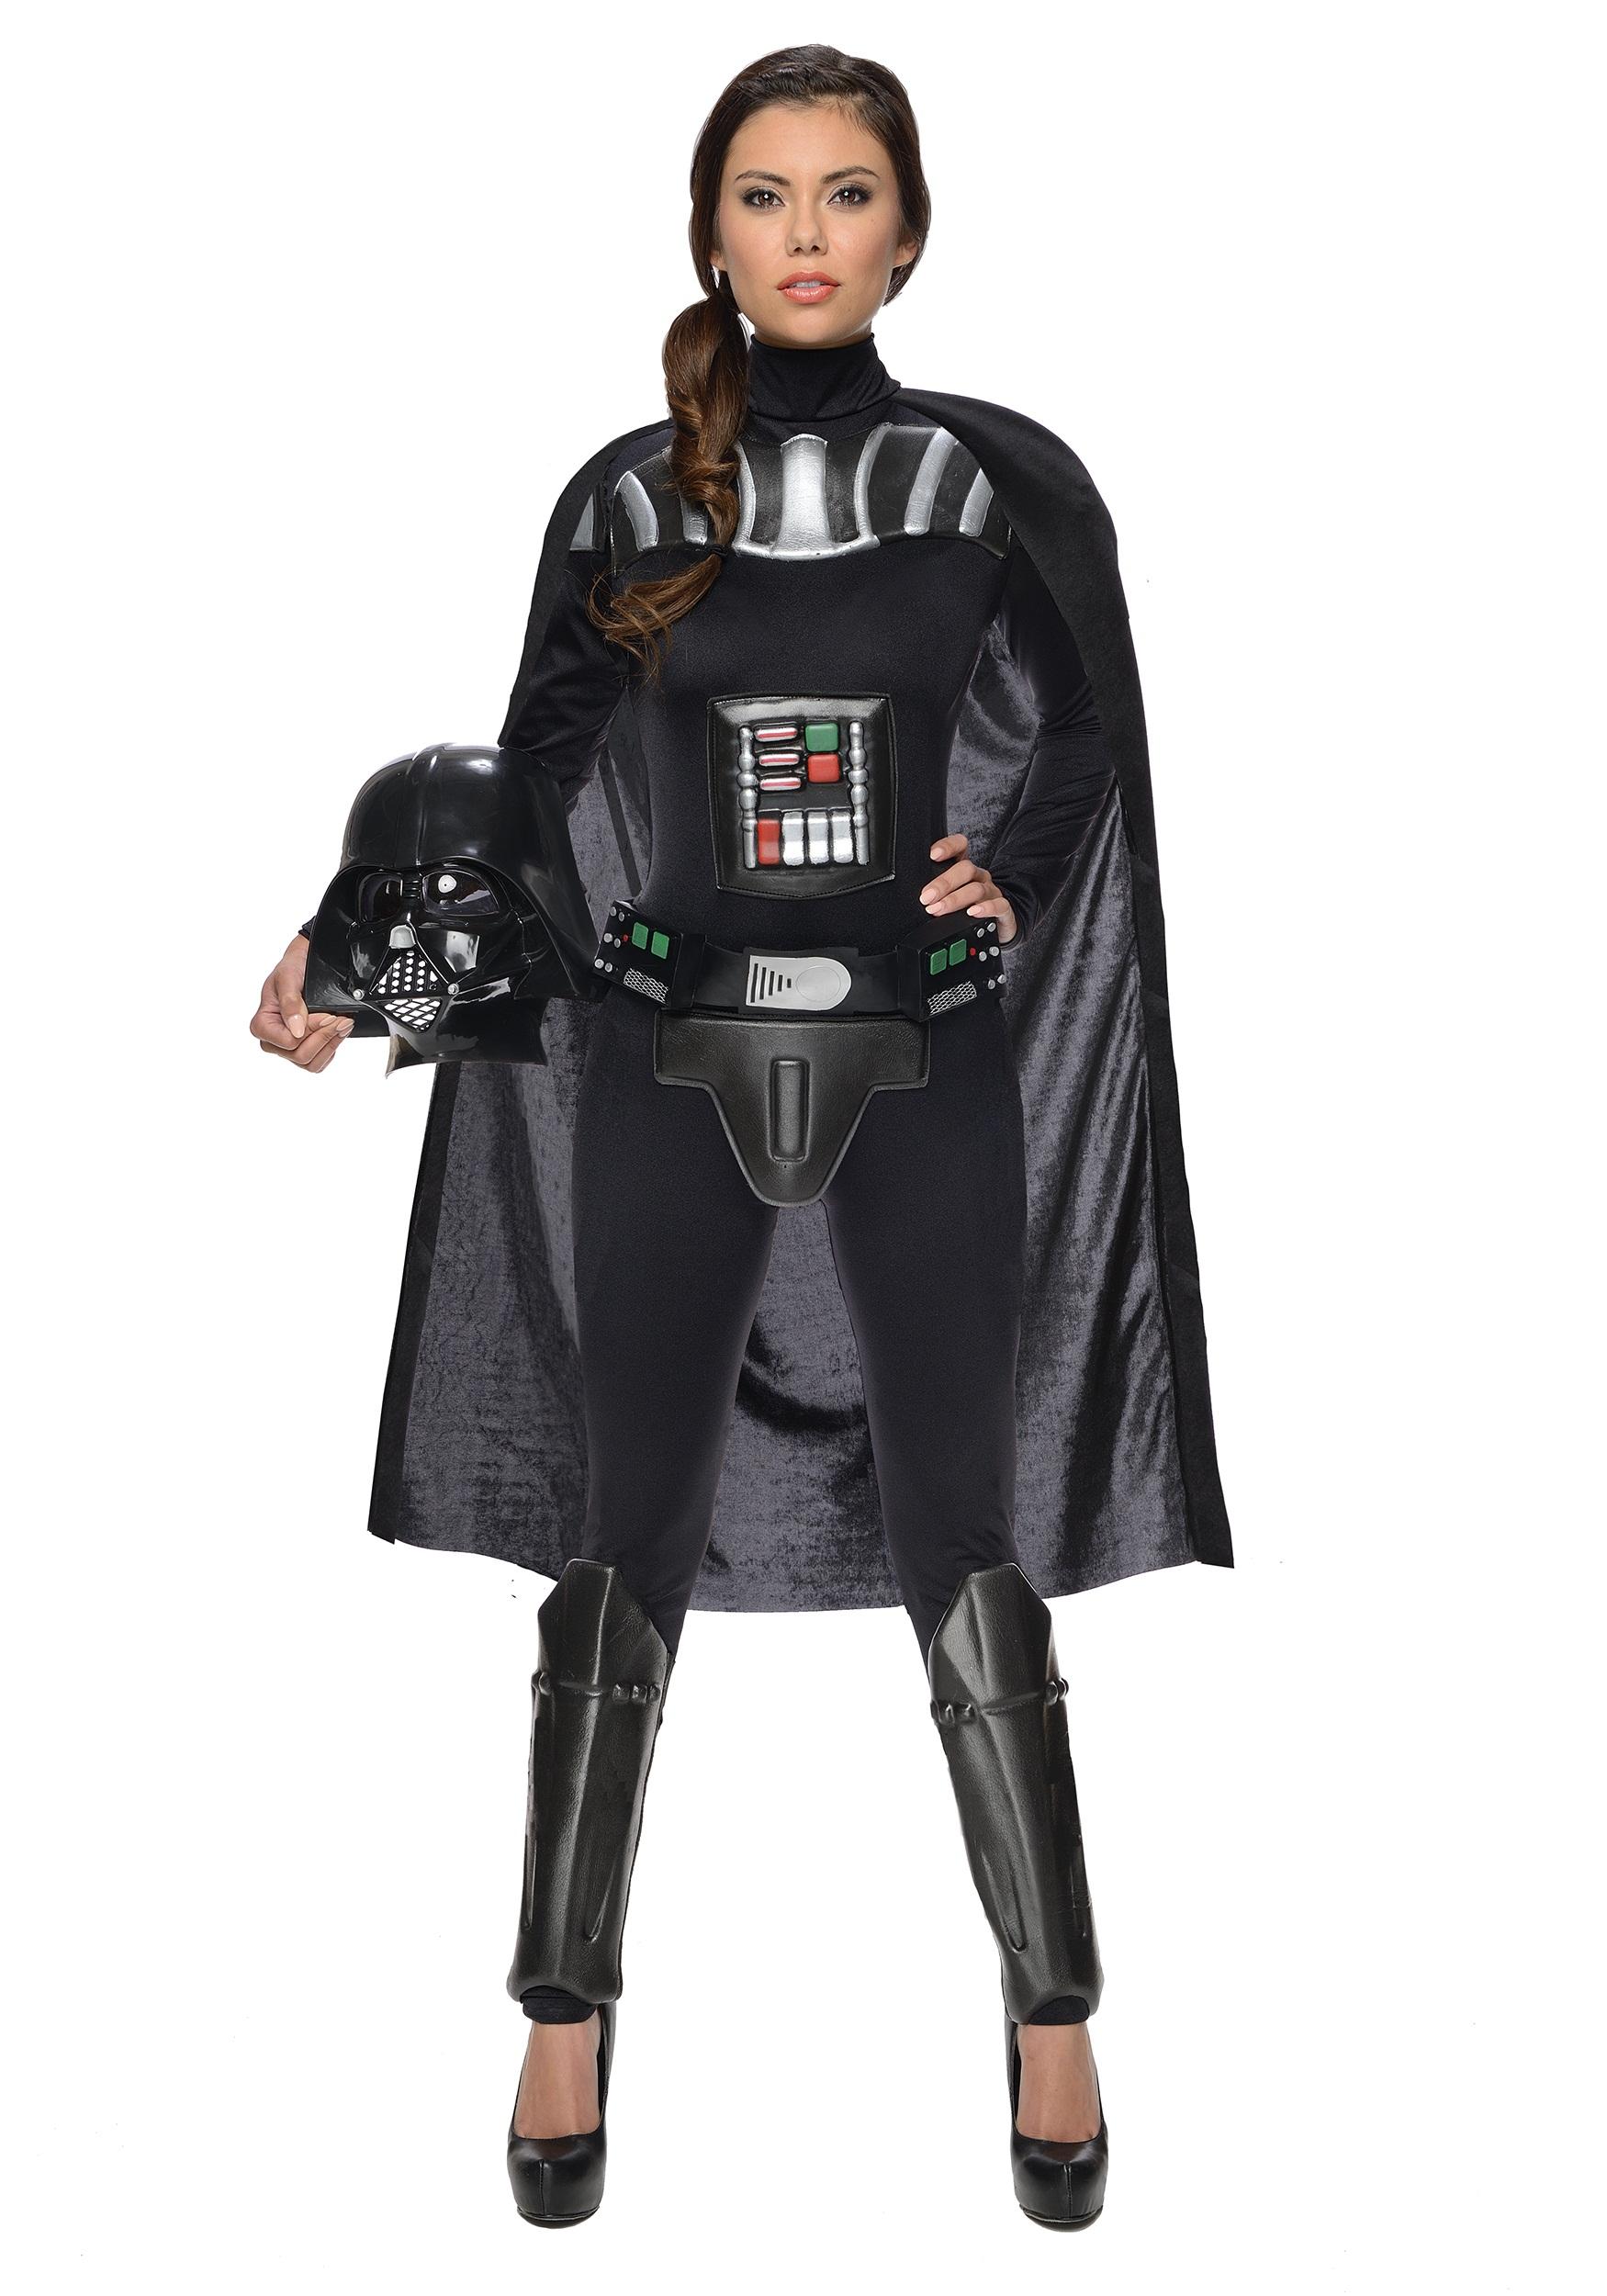 Fullsize Of Darth Vader Costume